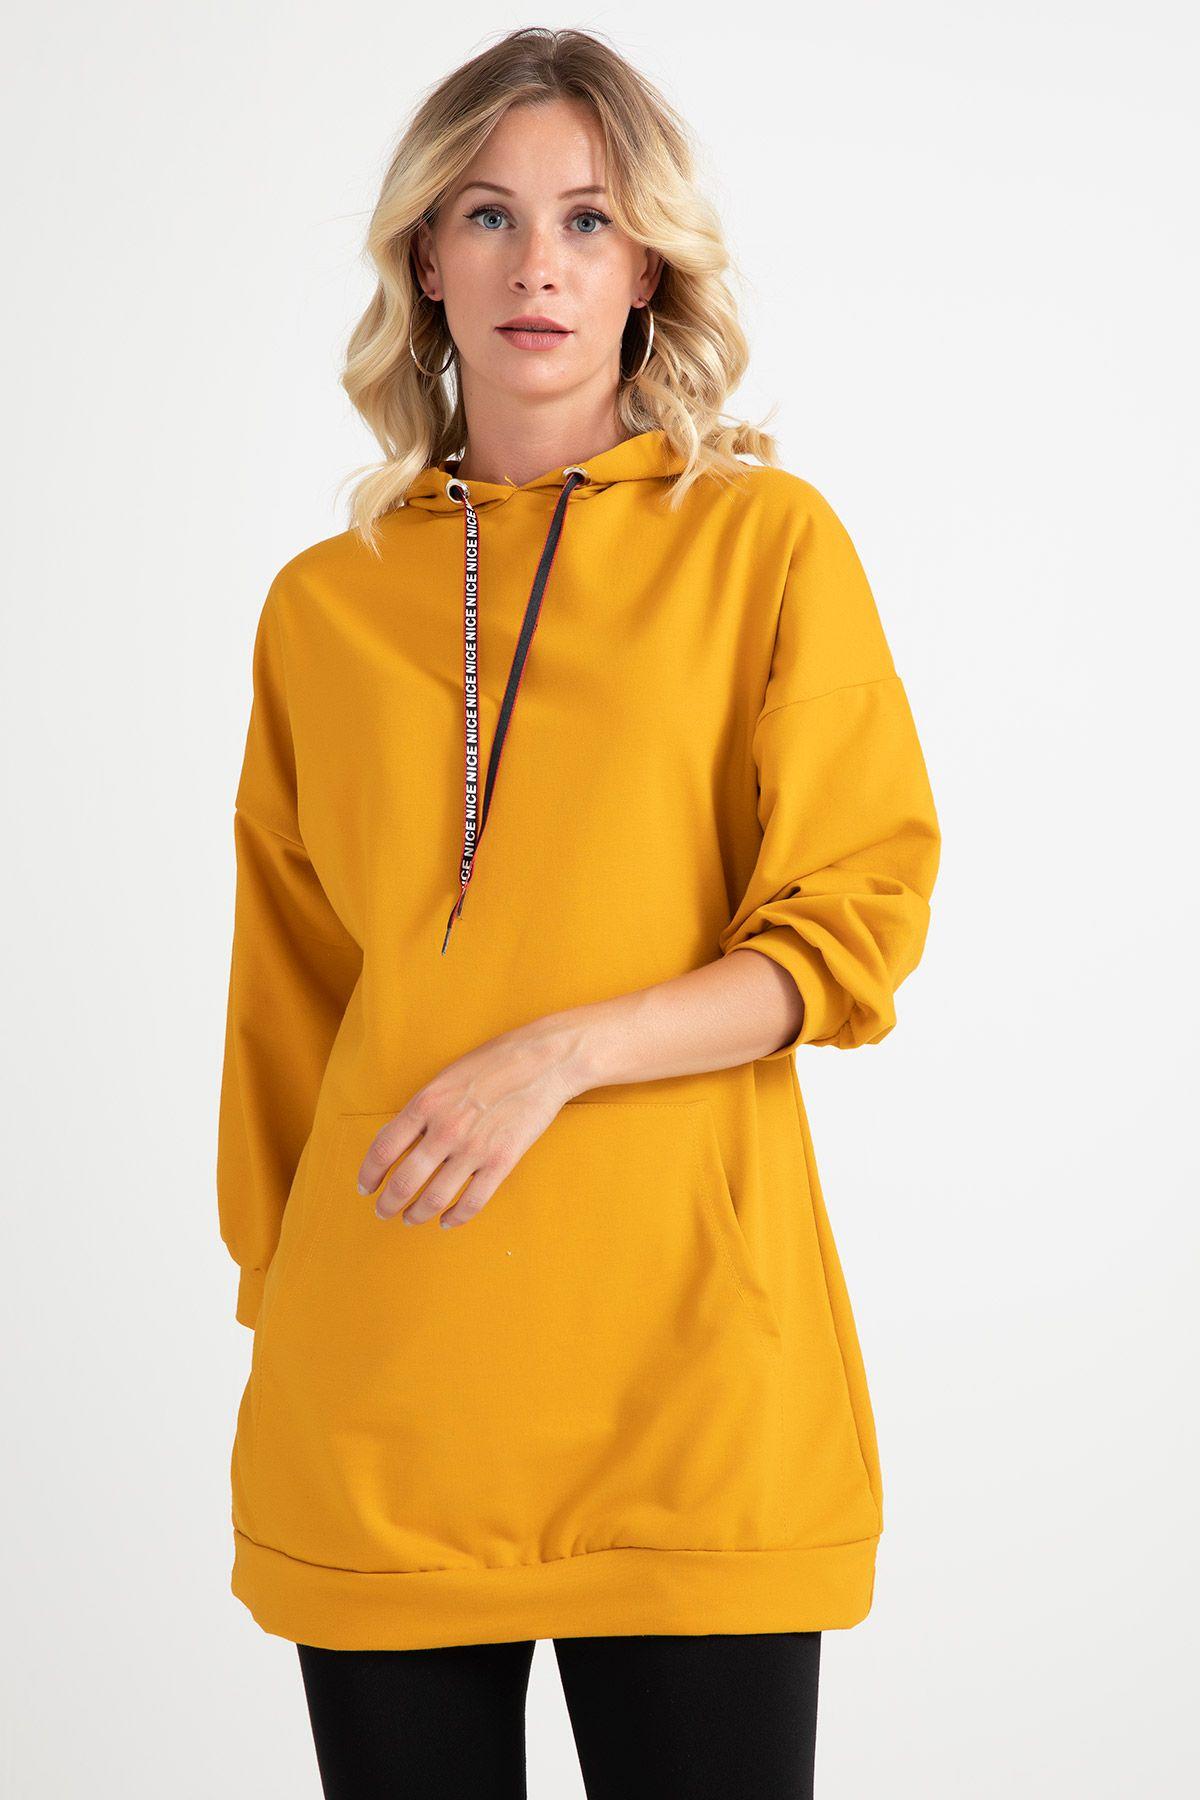 Knitwear - Tunic -Mustard